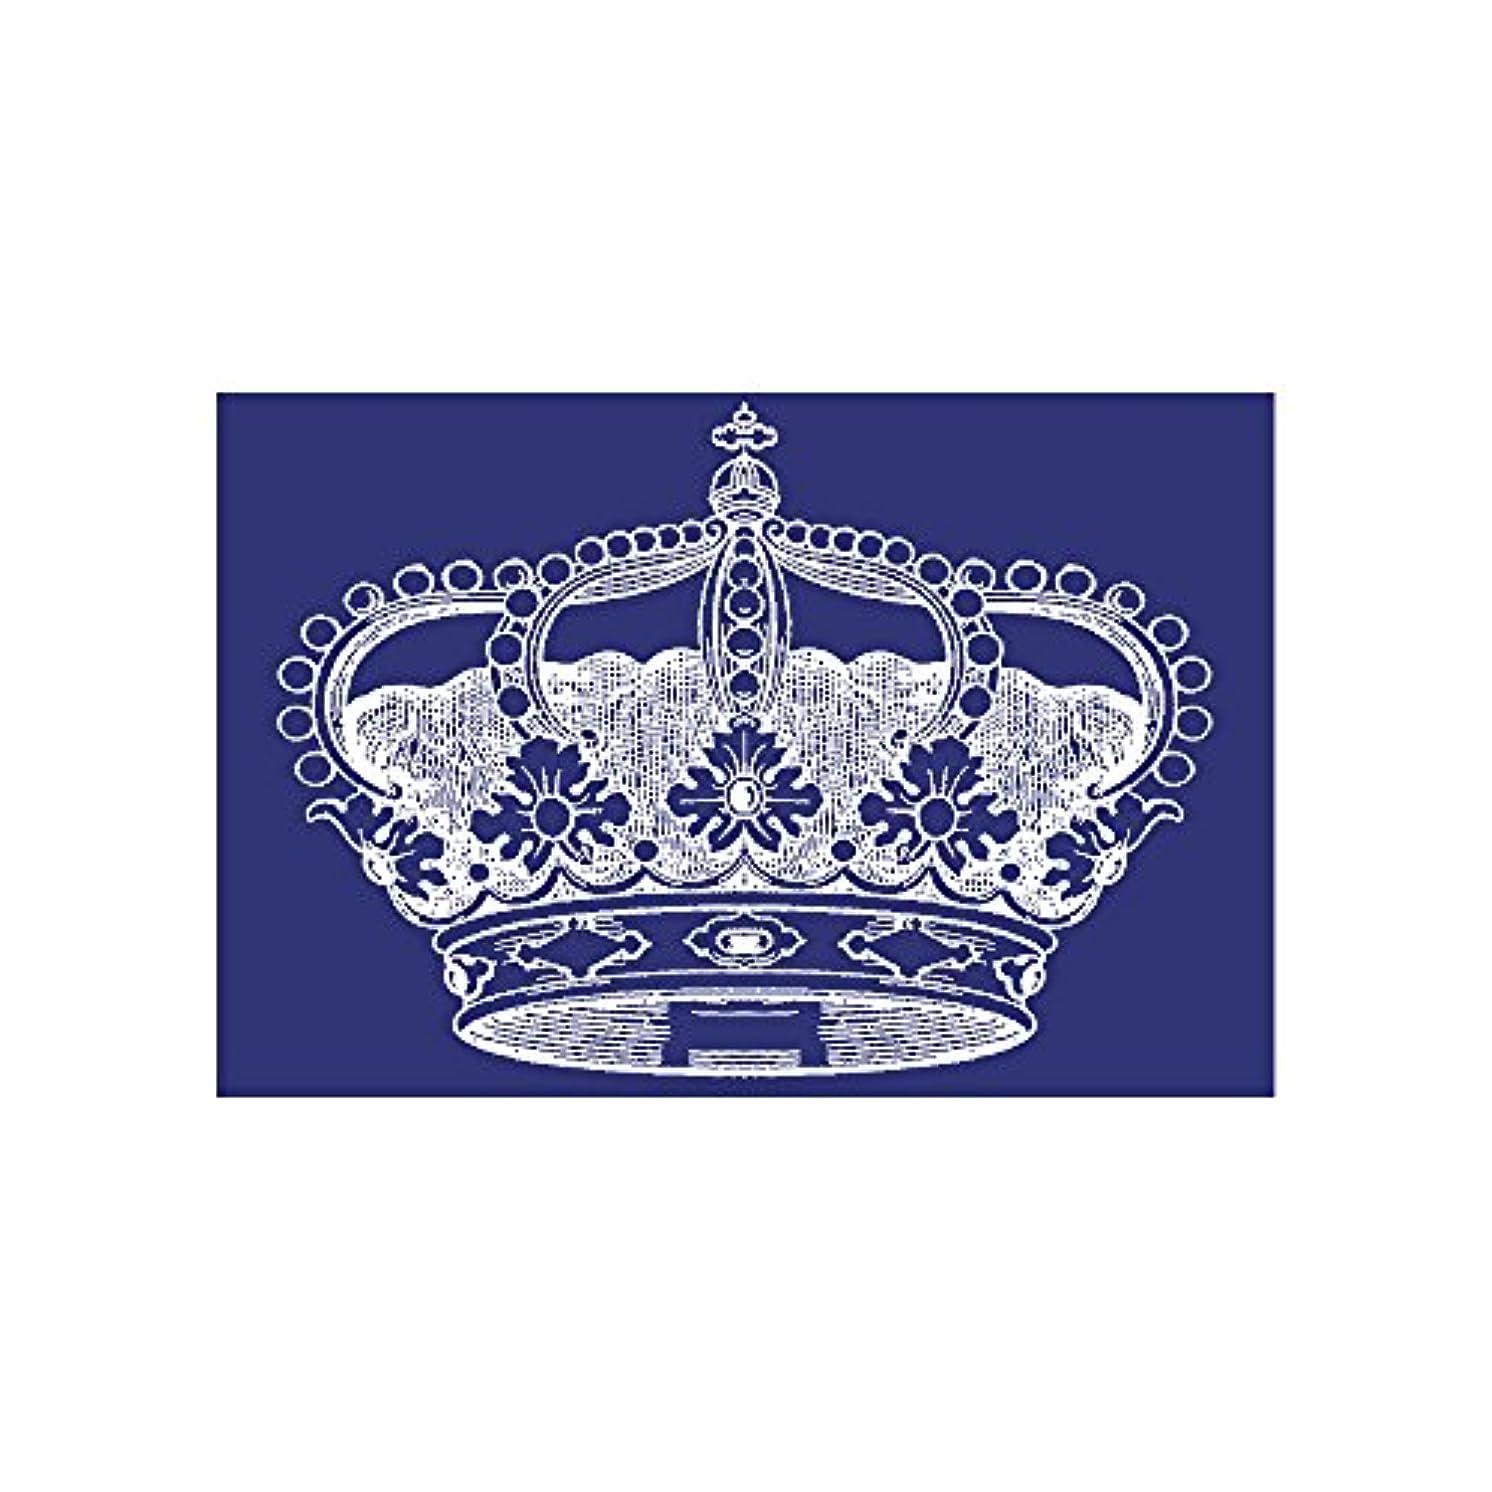 Rayher Crown Din A5 Stencil Plus Coating Knife in Tab-Bag, Blue